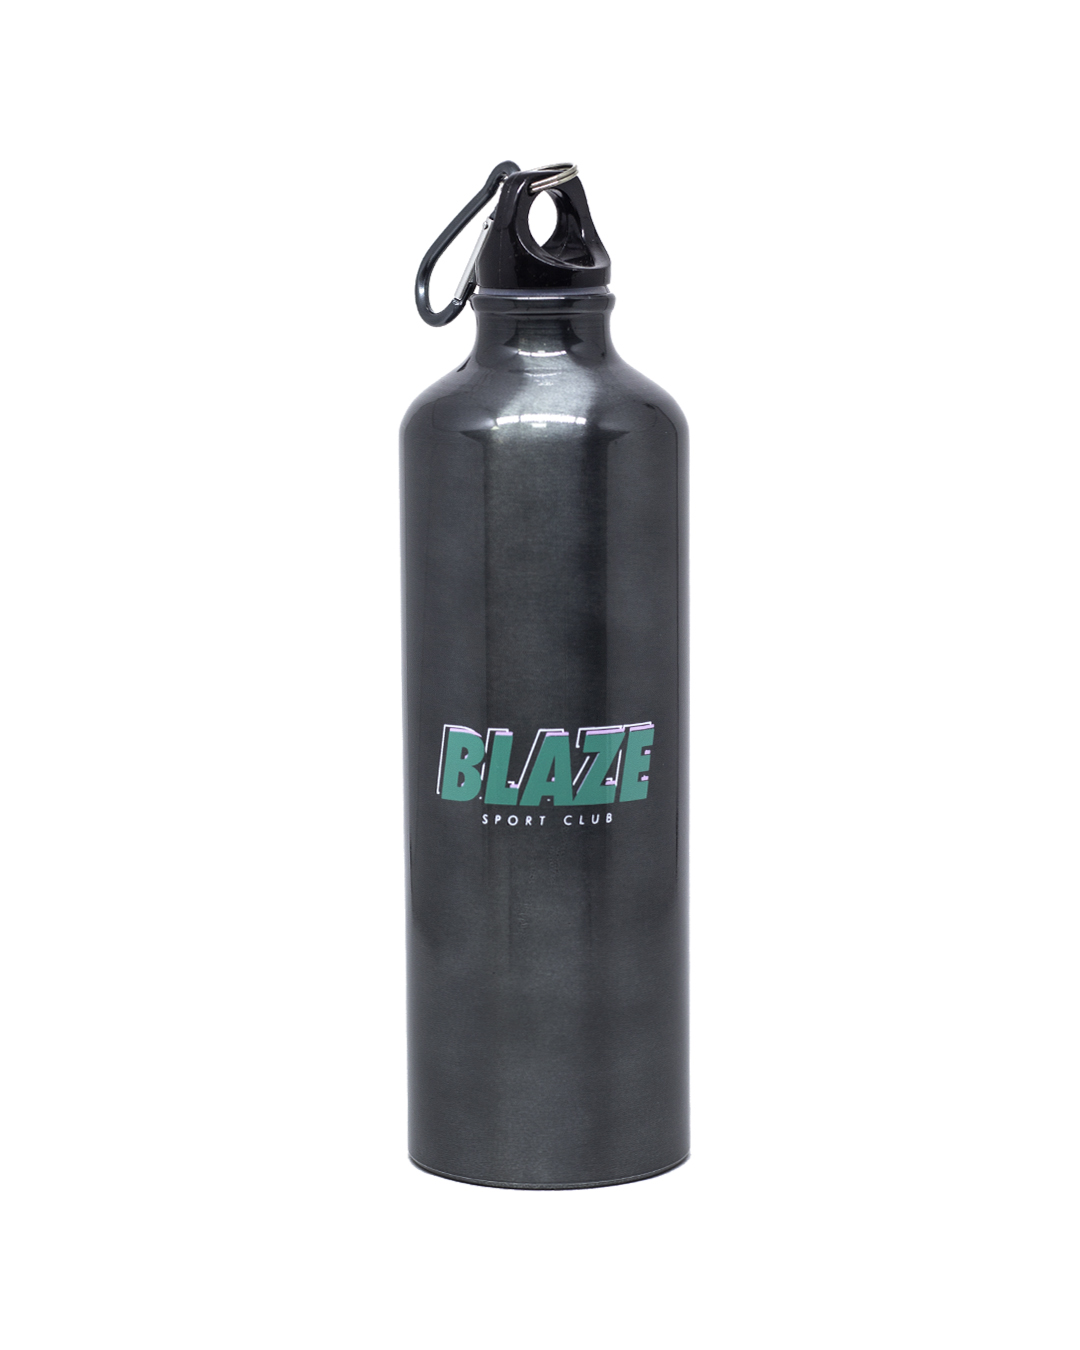 Garrafa Sport Club Blaze Supply